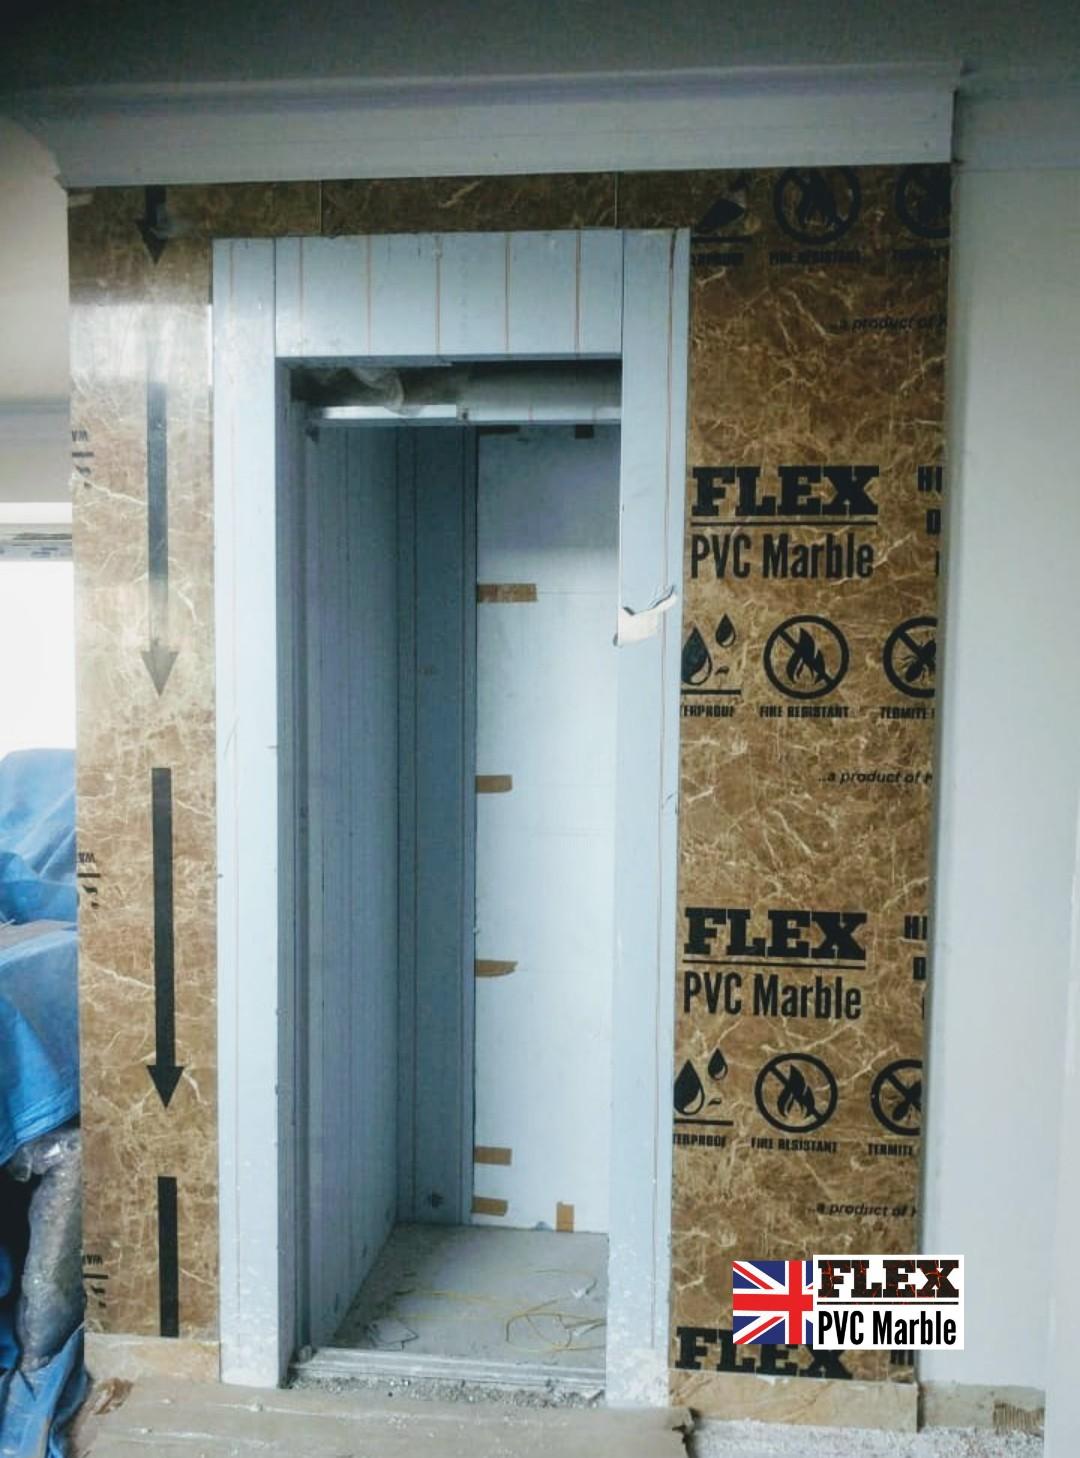 FLEX MARBLE LIFT DECORATION PVC MARBLE U